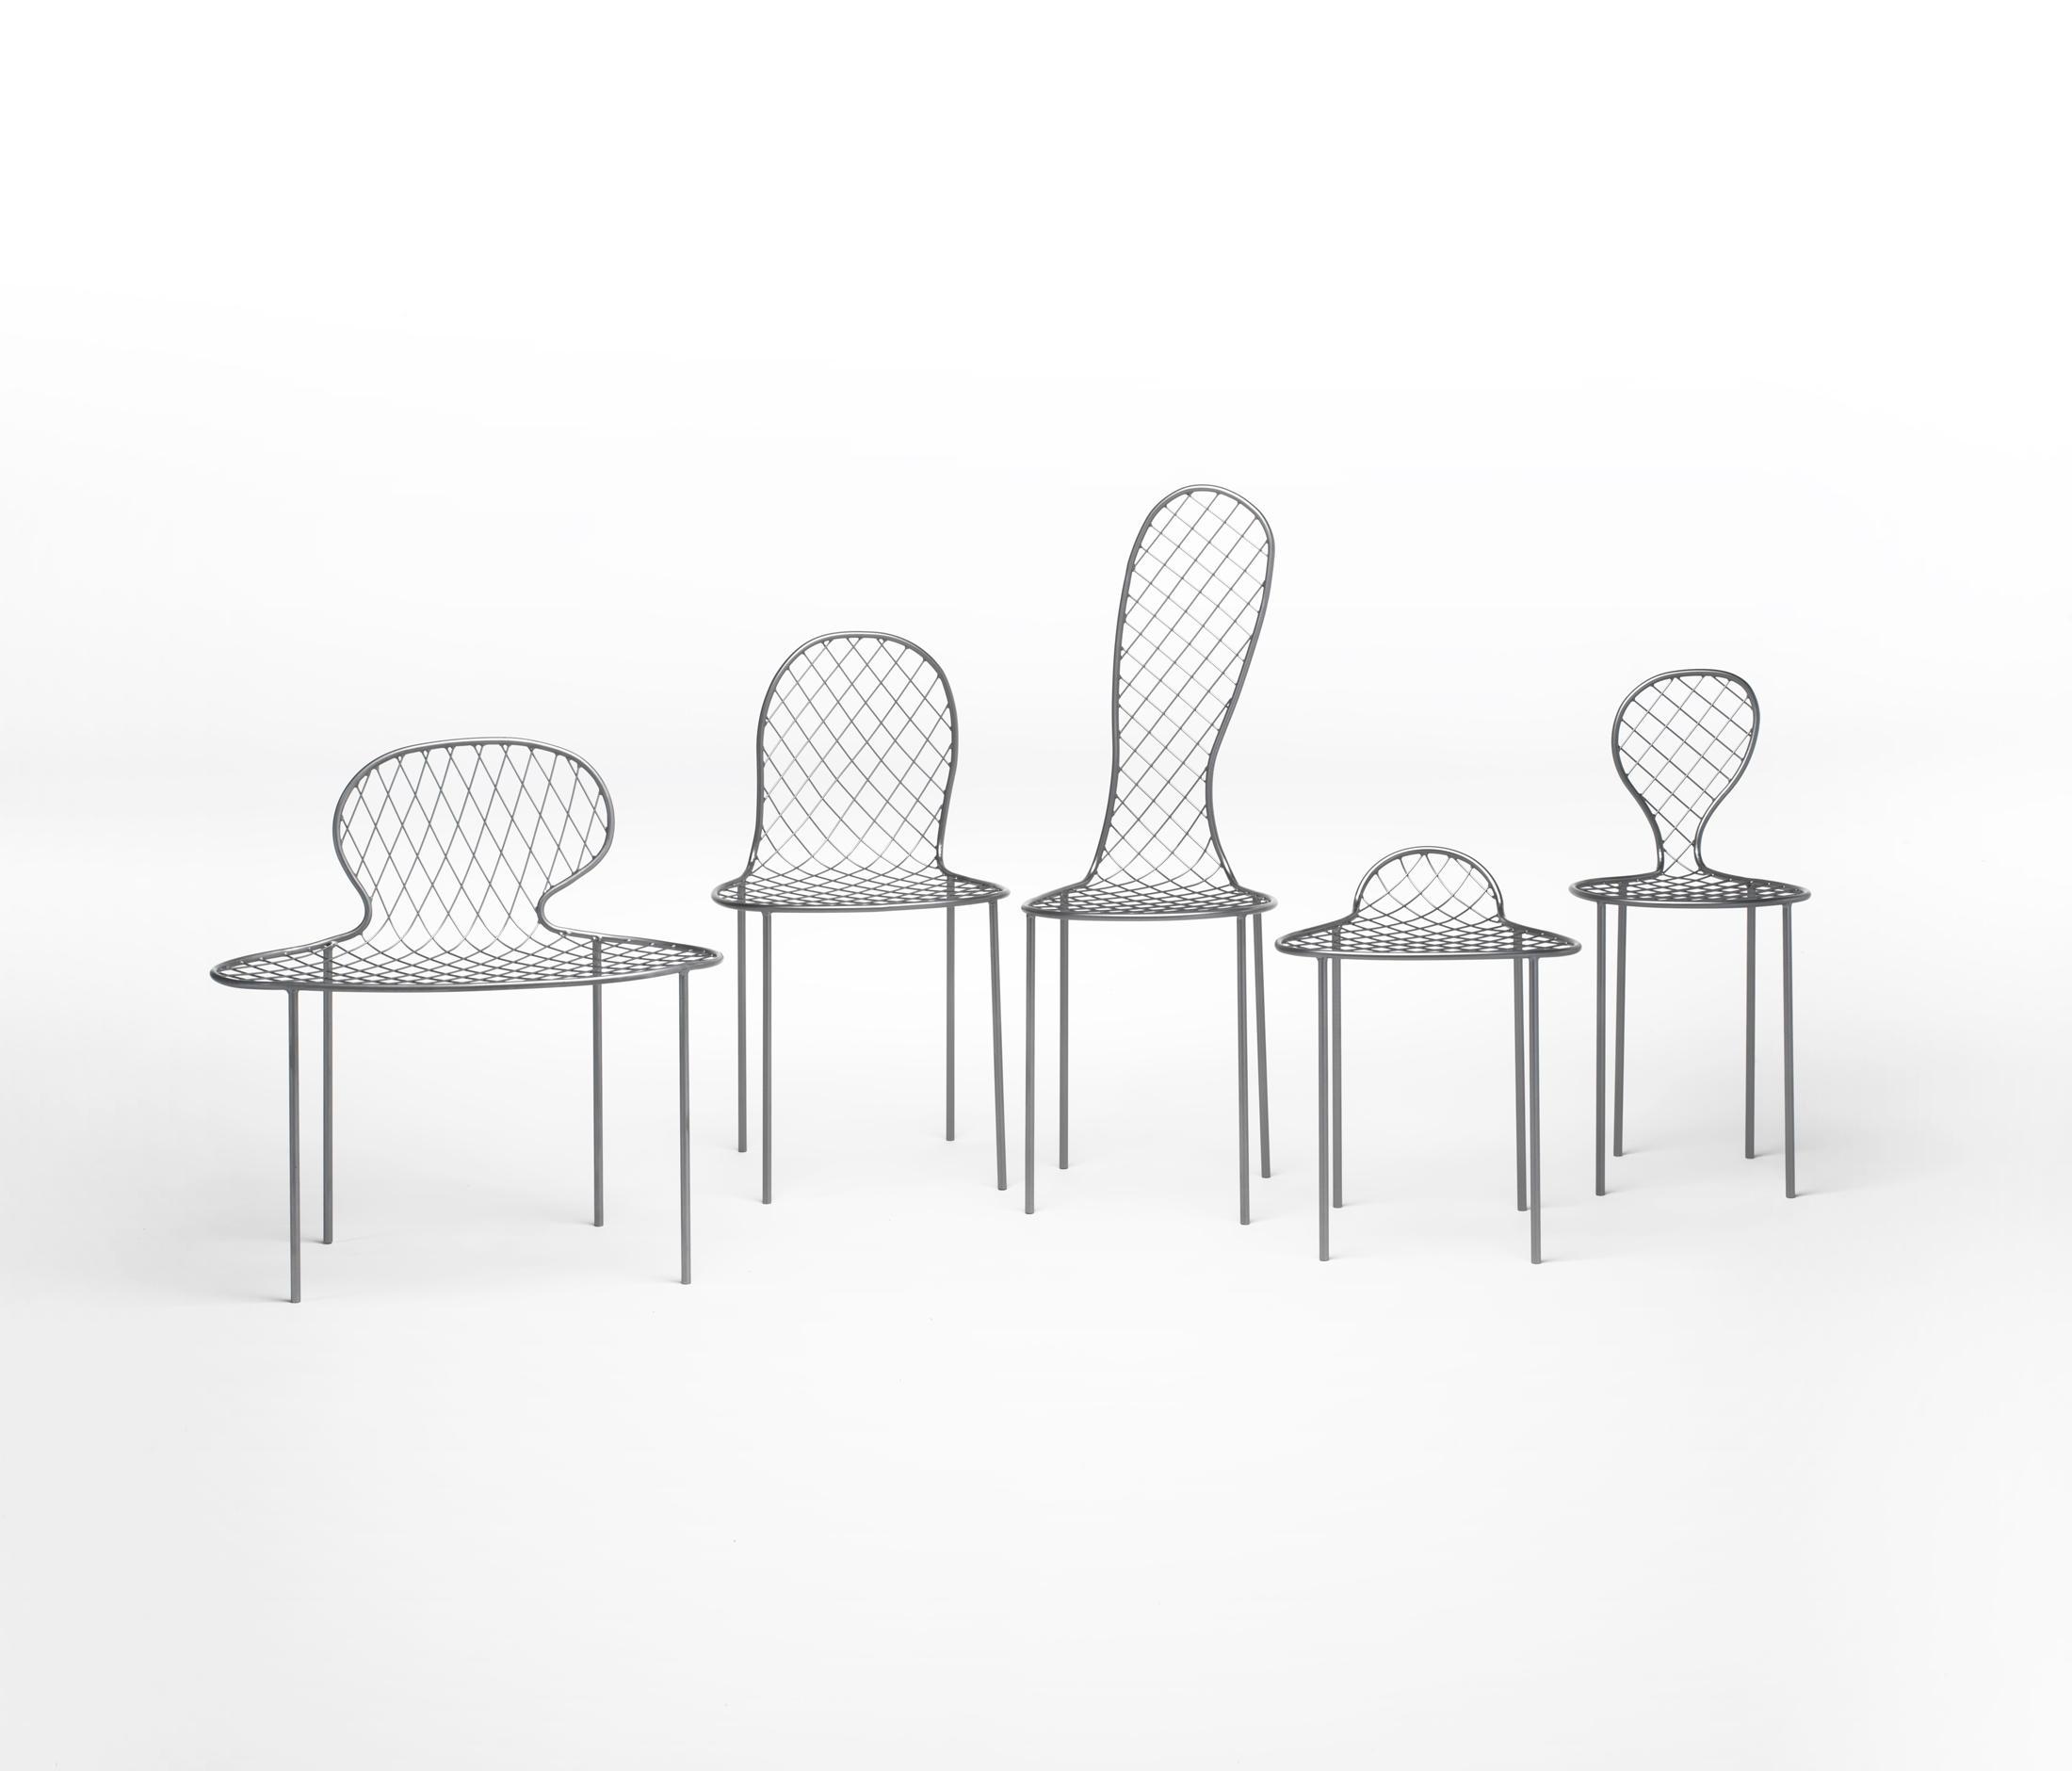 Sedie dwg prospetto sedie ufficio dwg lusso sala riunioni dwg tavoli metamorfosi divano come - Sala da pranzo dwg ...